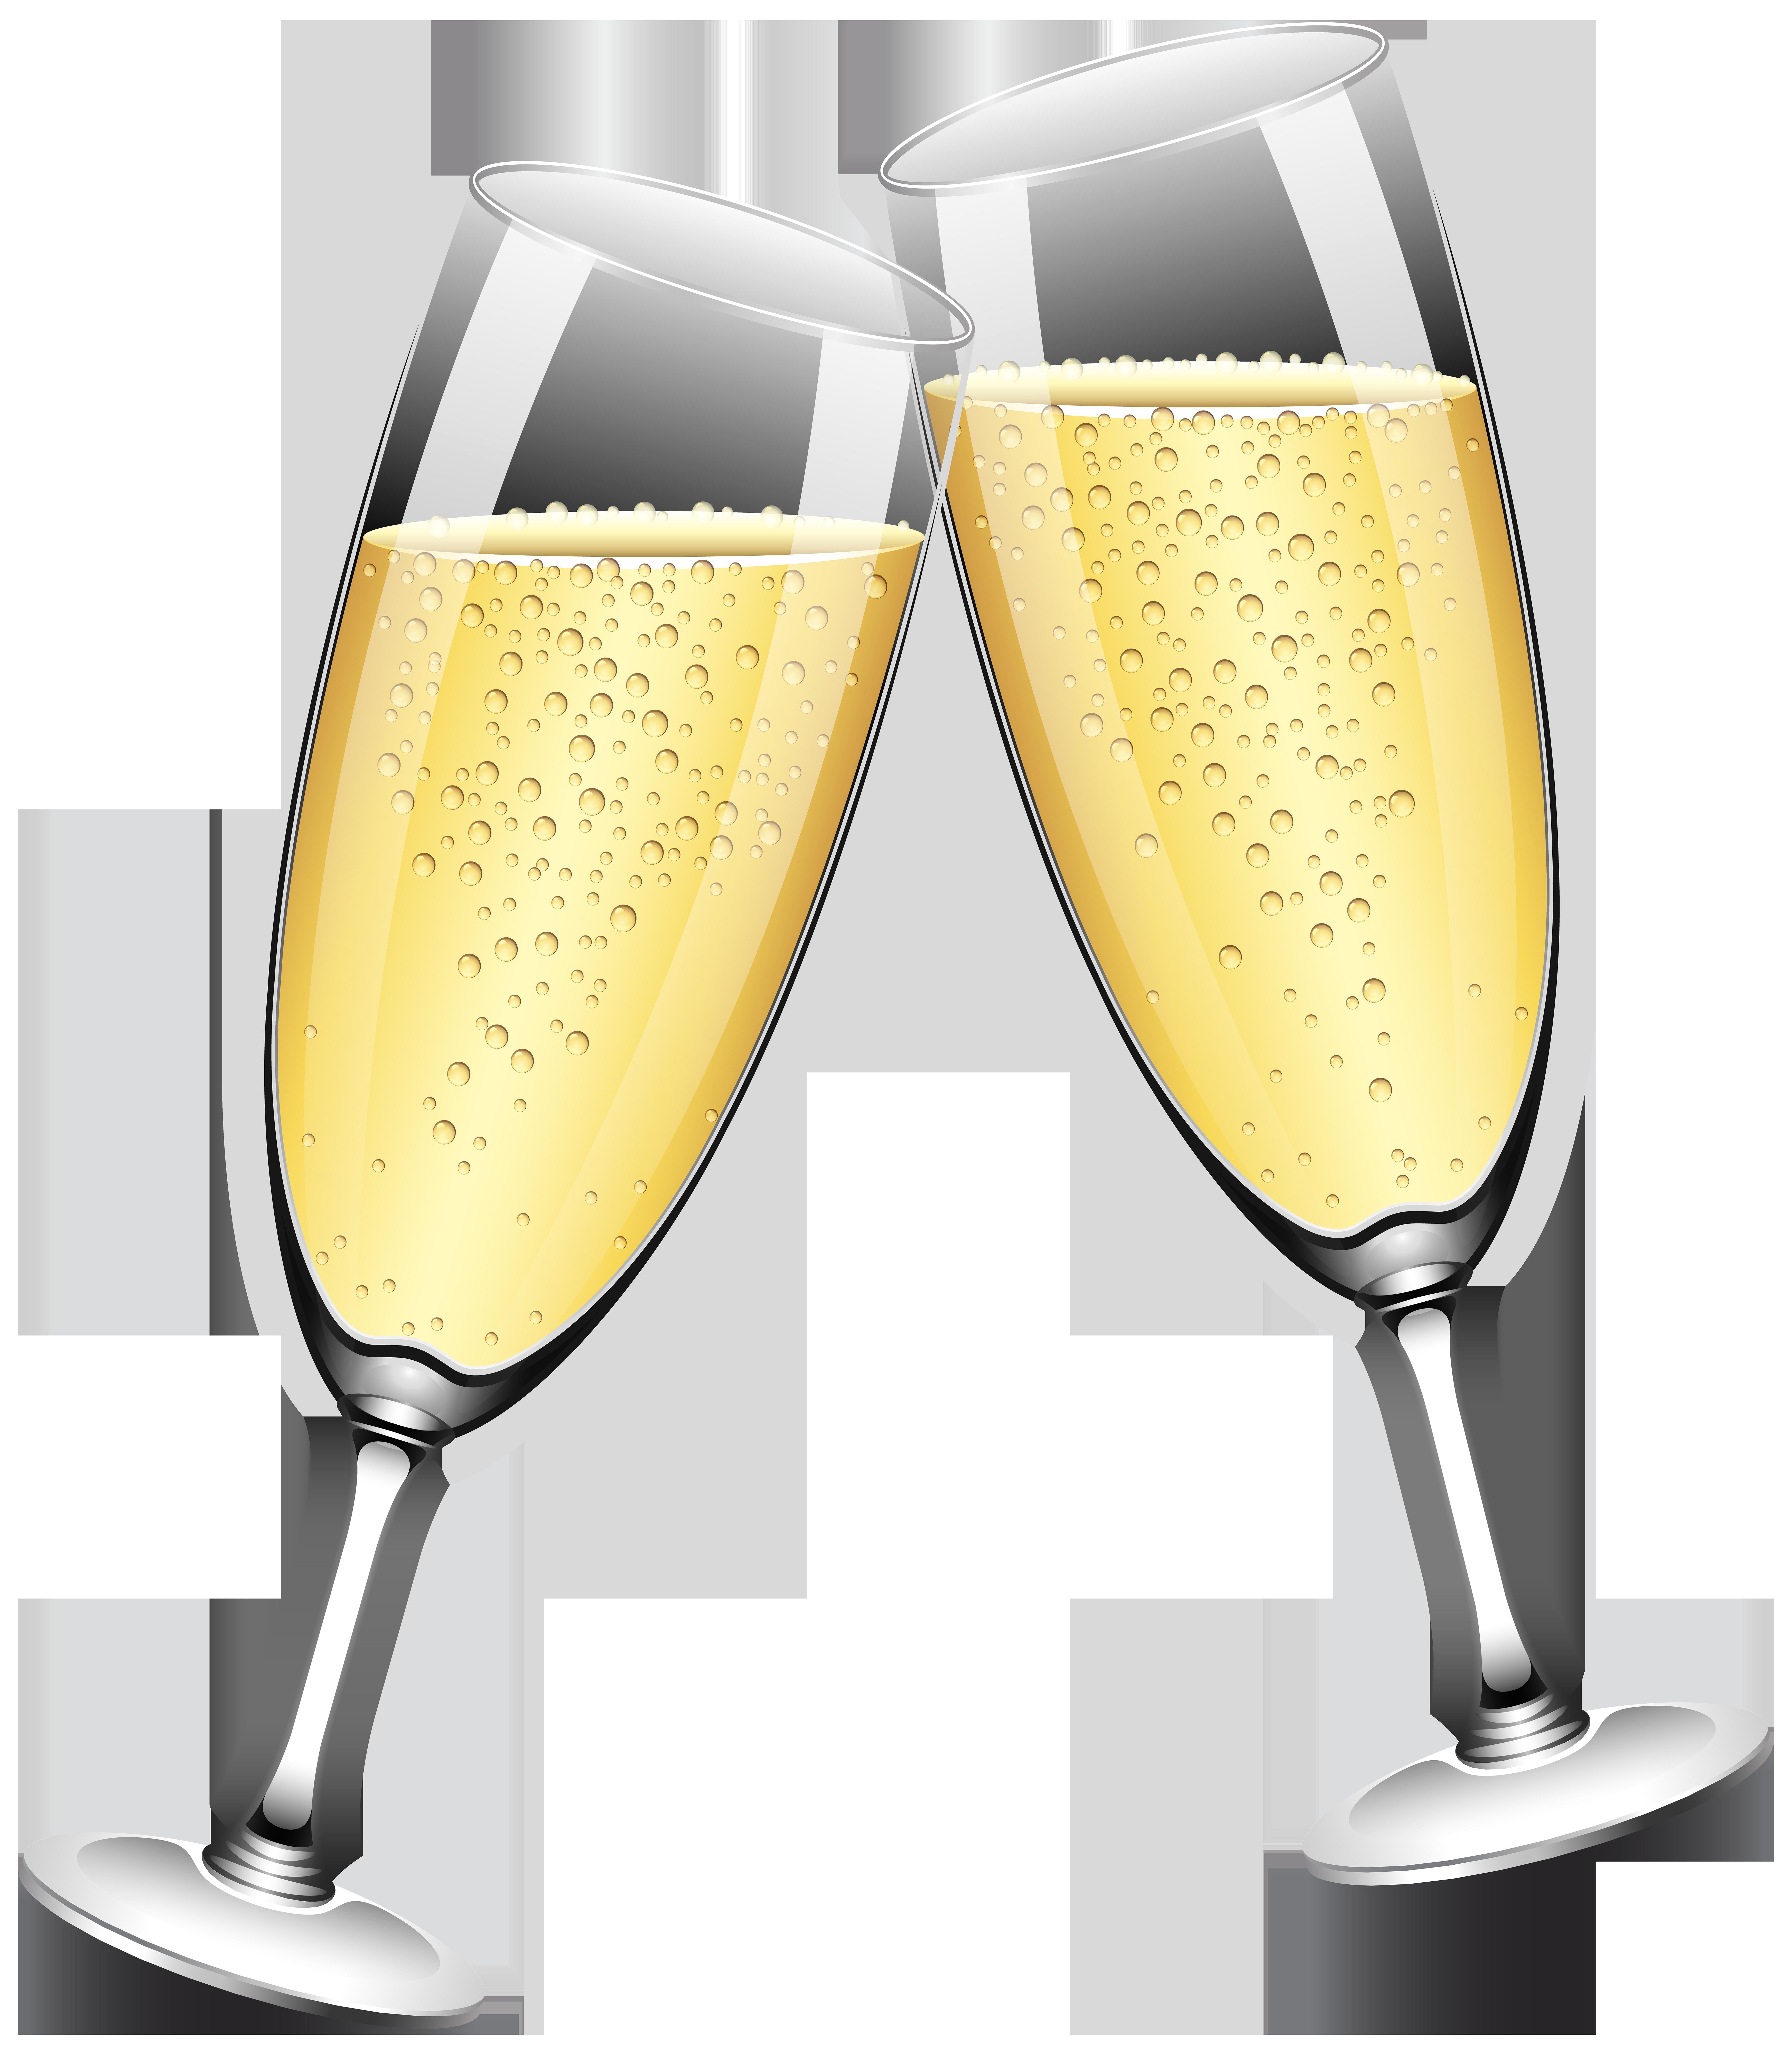 Wedding champagne glasses clipart banner transparent library Wedding Champagne Glasses PNG Clip Art - Best WEB Clipart banner transparent library